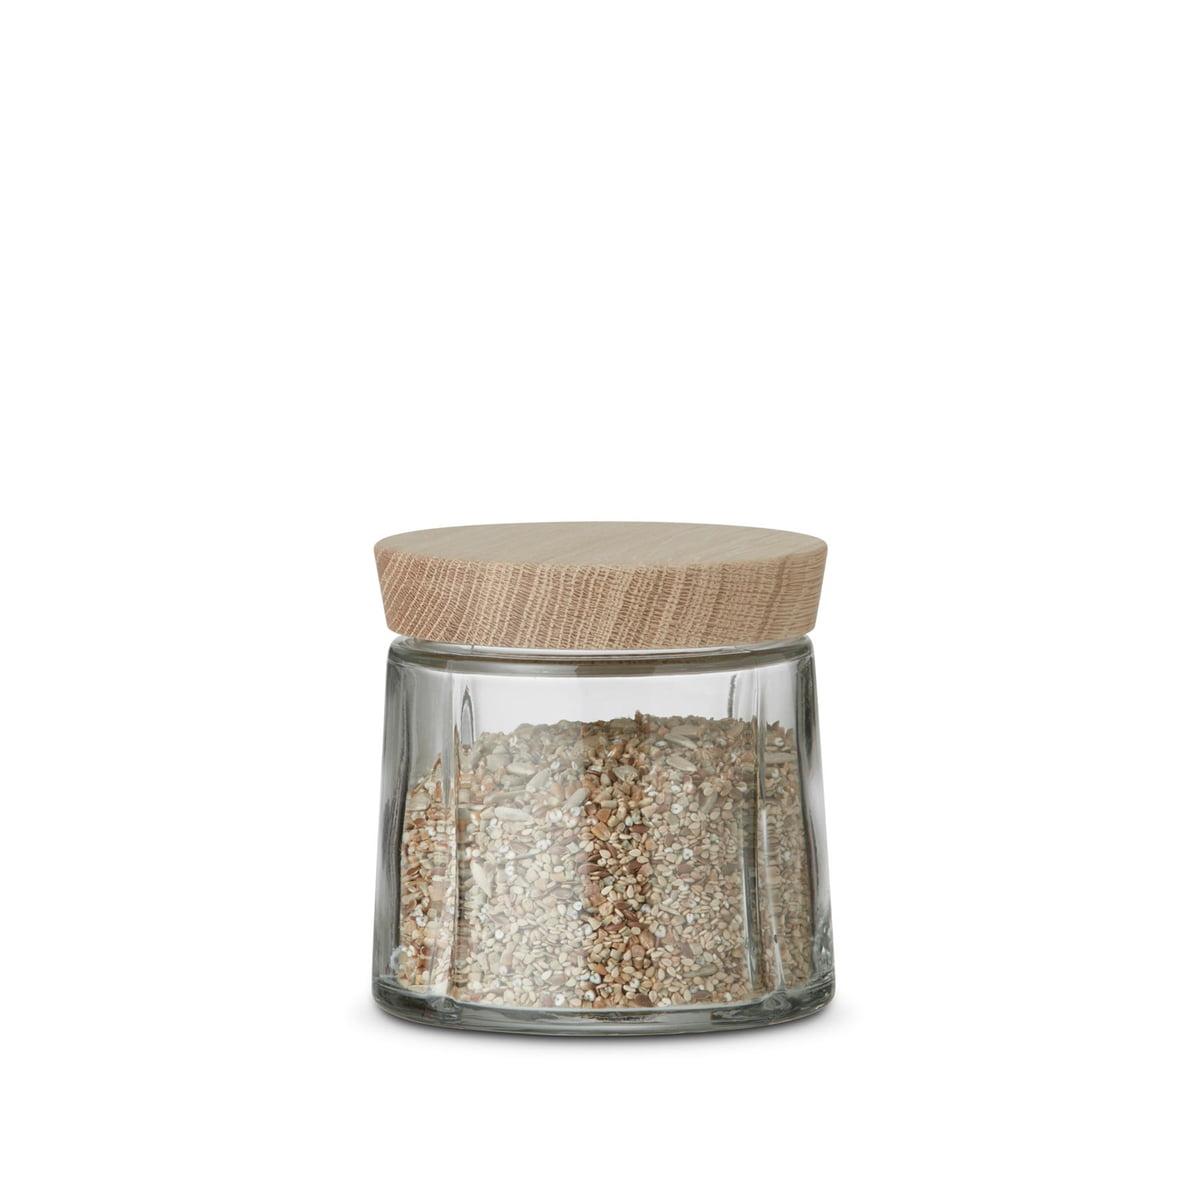 Rosendahl - Grand Cru bocaux en verre / chêne, 0,5 litre